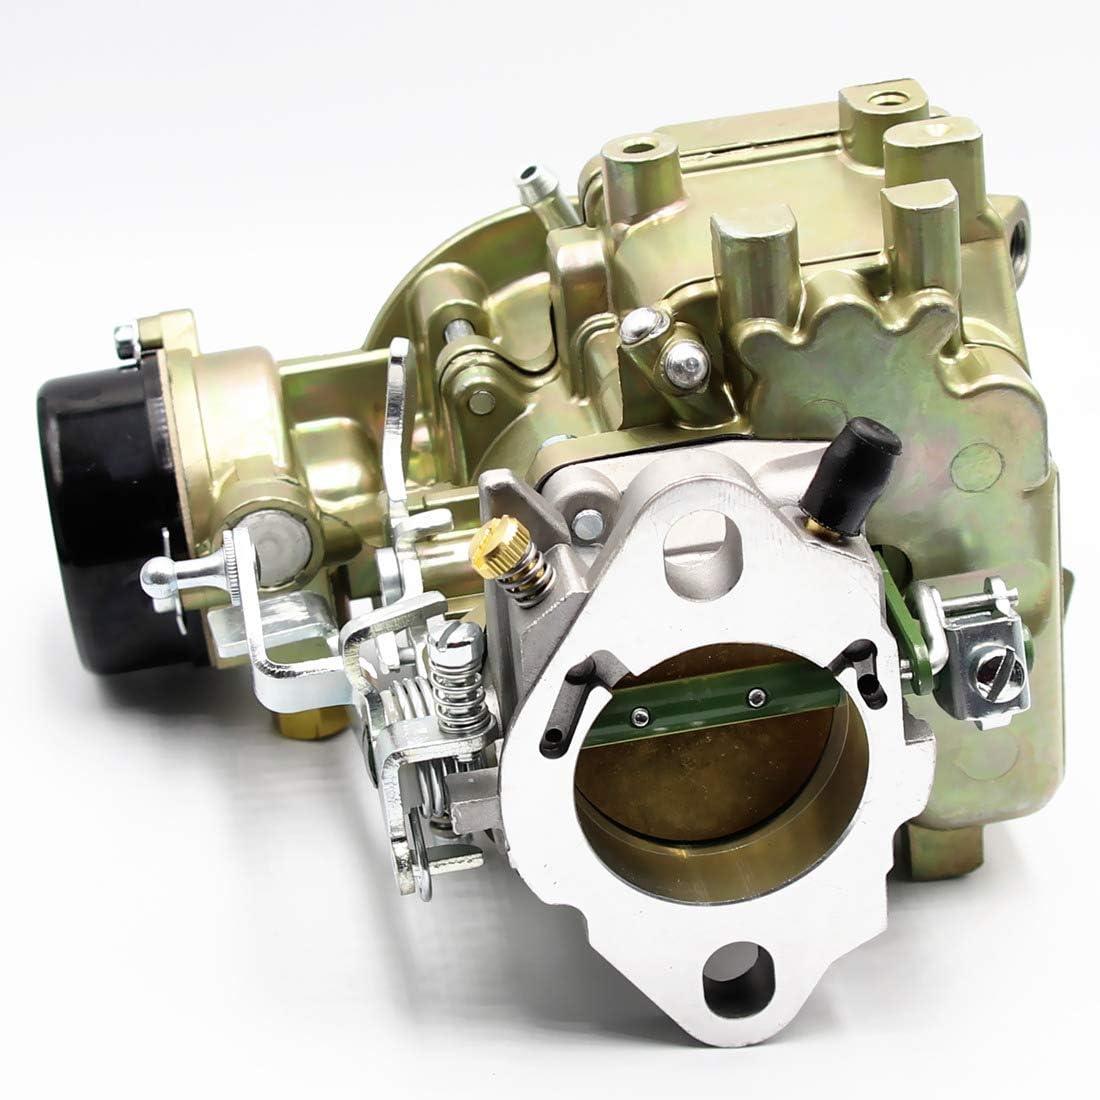 Automatic Choke D5TZ9510AG Carburetor for Ford YF C1YF 6 CIL Type 240 250 300 Engine 6 Cylinder 1975-1982 Replaces/RSC-300A 6307S 6054 C1YFA C6203